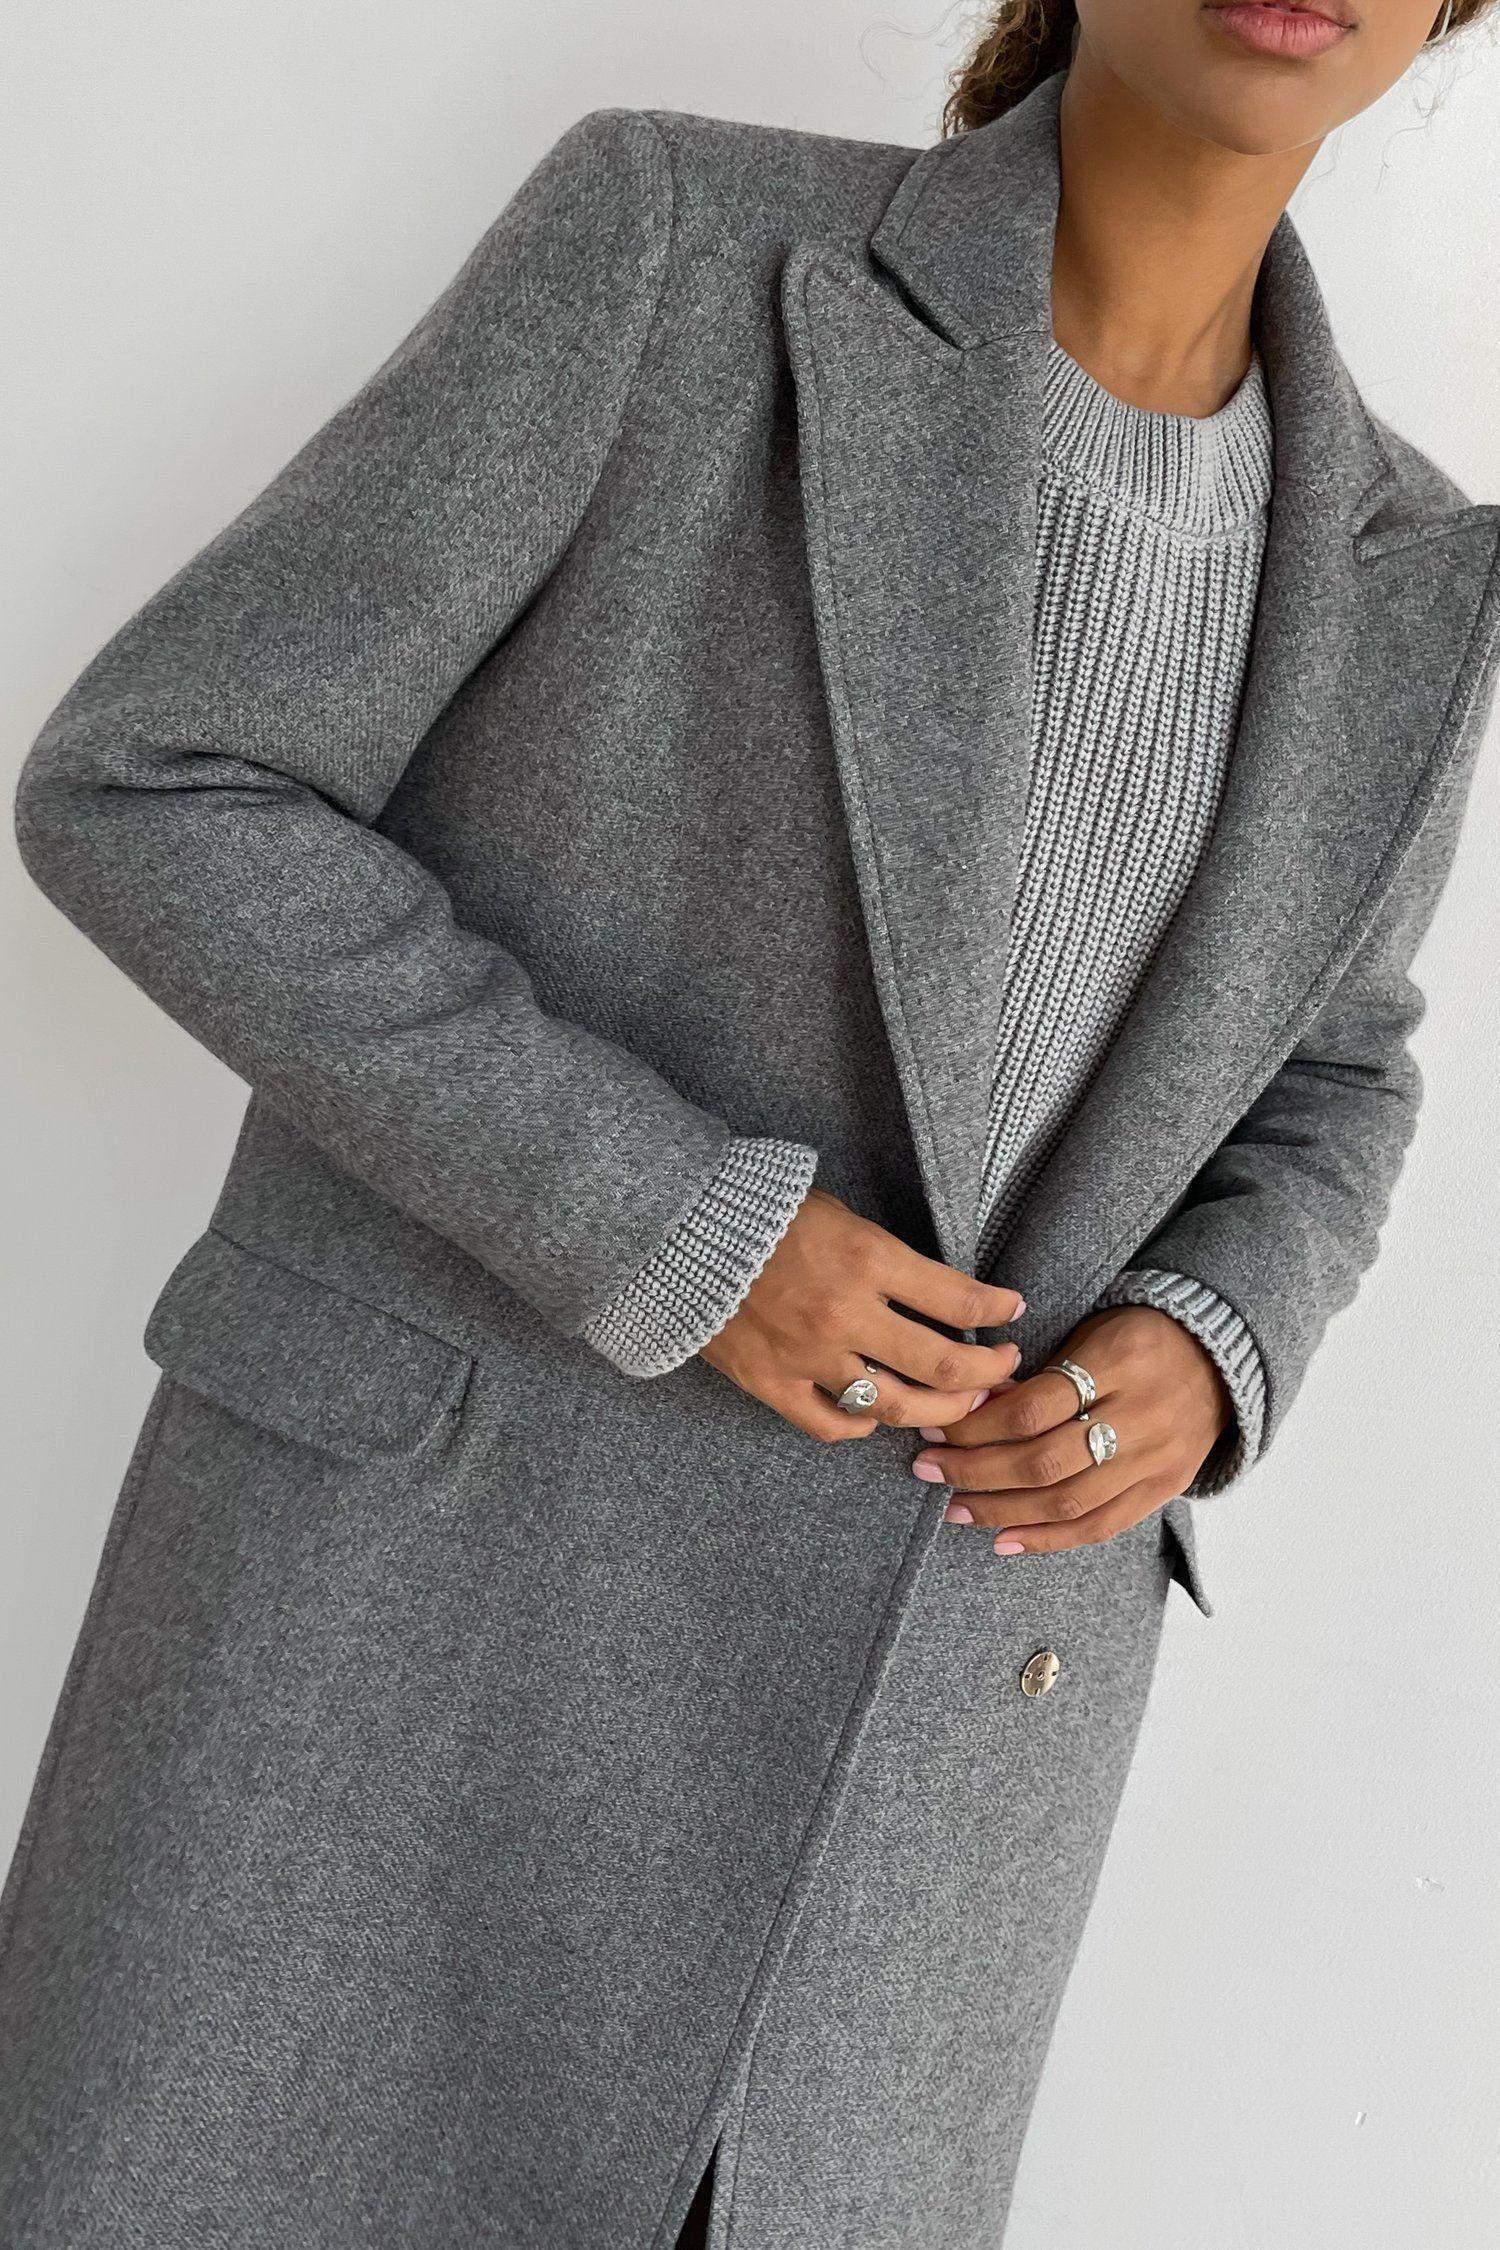 Пальто шерстяное оверсайз серое - THE LACE